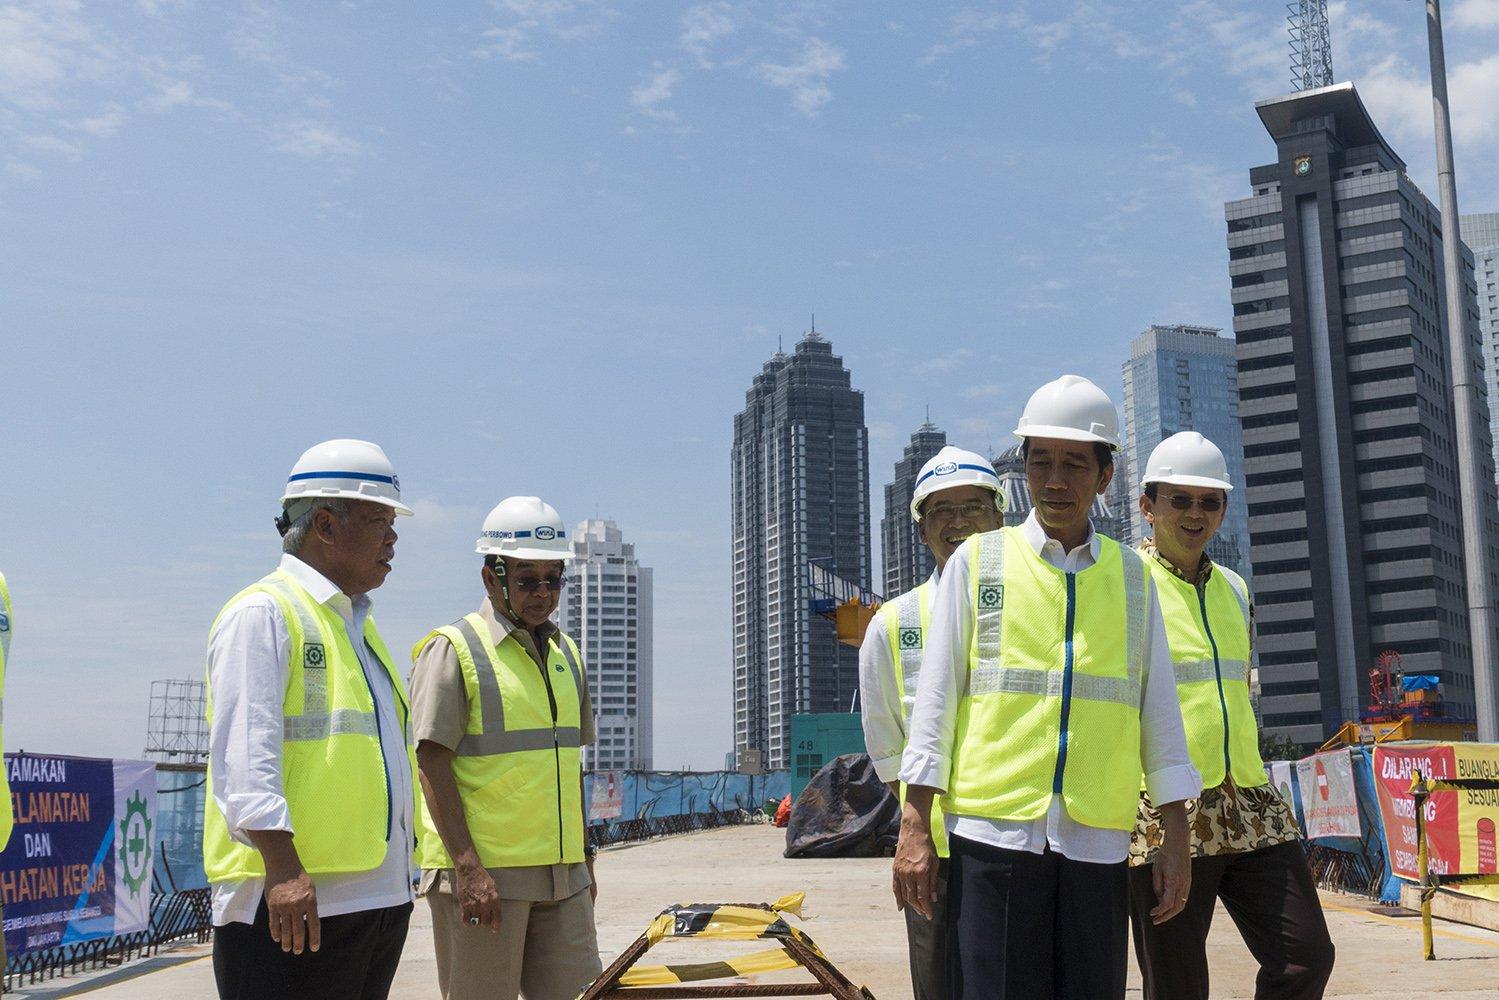 Presiden Joko Widodo (kedua kanan) didampingi Menteri Perhubungan Budi Karya (ketiga kanan), Menteri PUPR Mochamad Basoeki Hadimoeljono (kiri), Gubernur DKI Jakarta Basuki T. Purnama (kanan), dan Dirut WIKA Bintang Perbowo (kedua kiri) meninjau proyek simpang susun Semanggi, di kawasan Semanggi, Jakarta, Kamis (23/2).